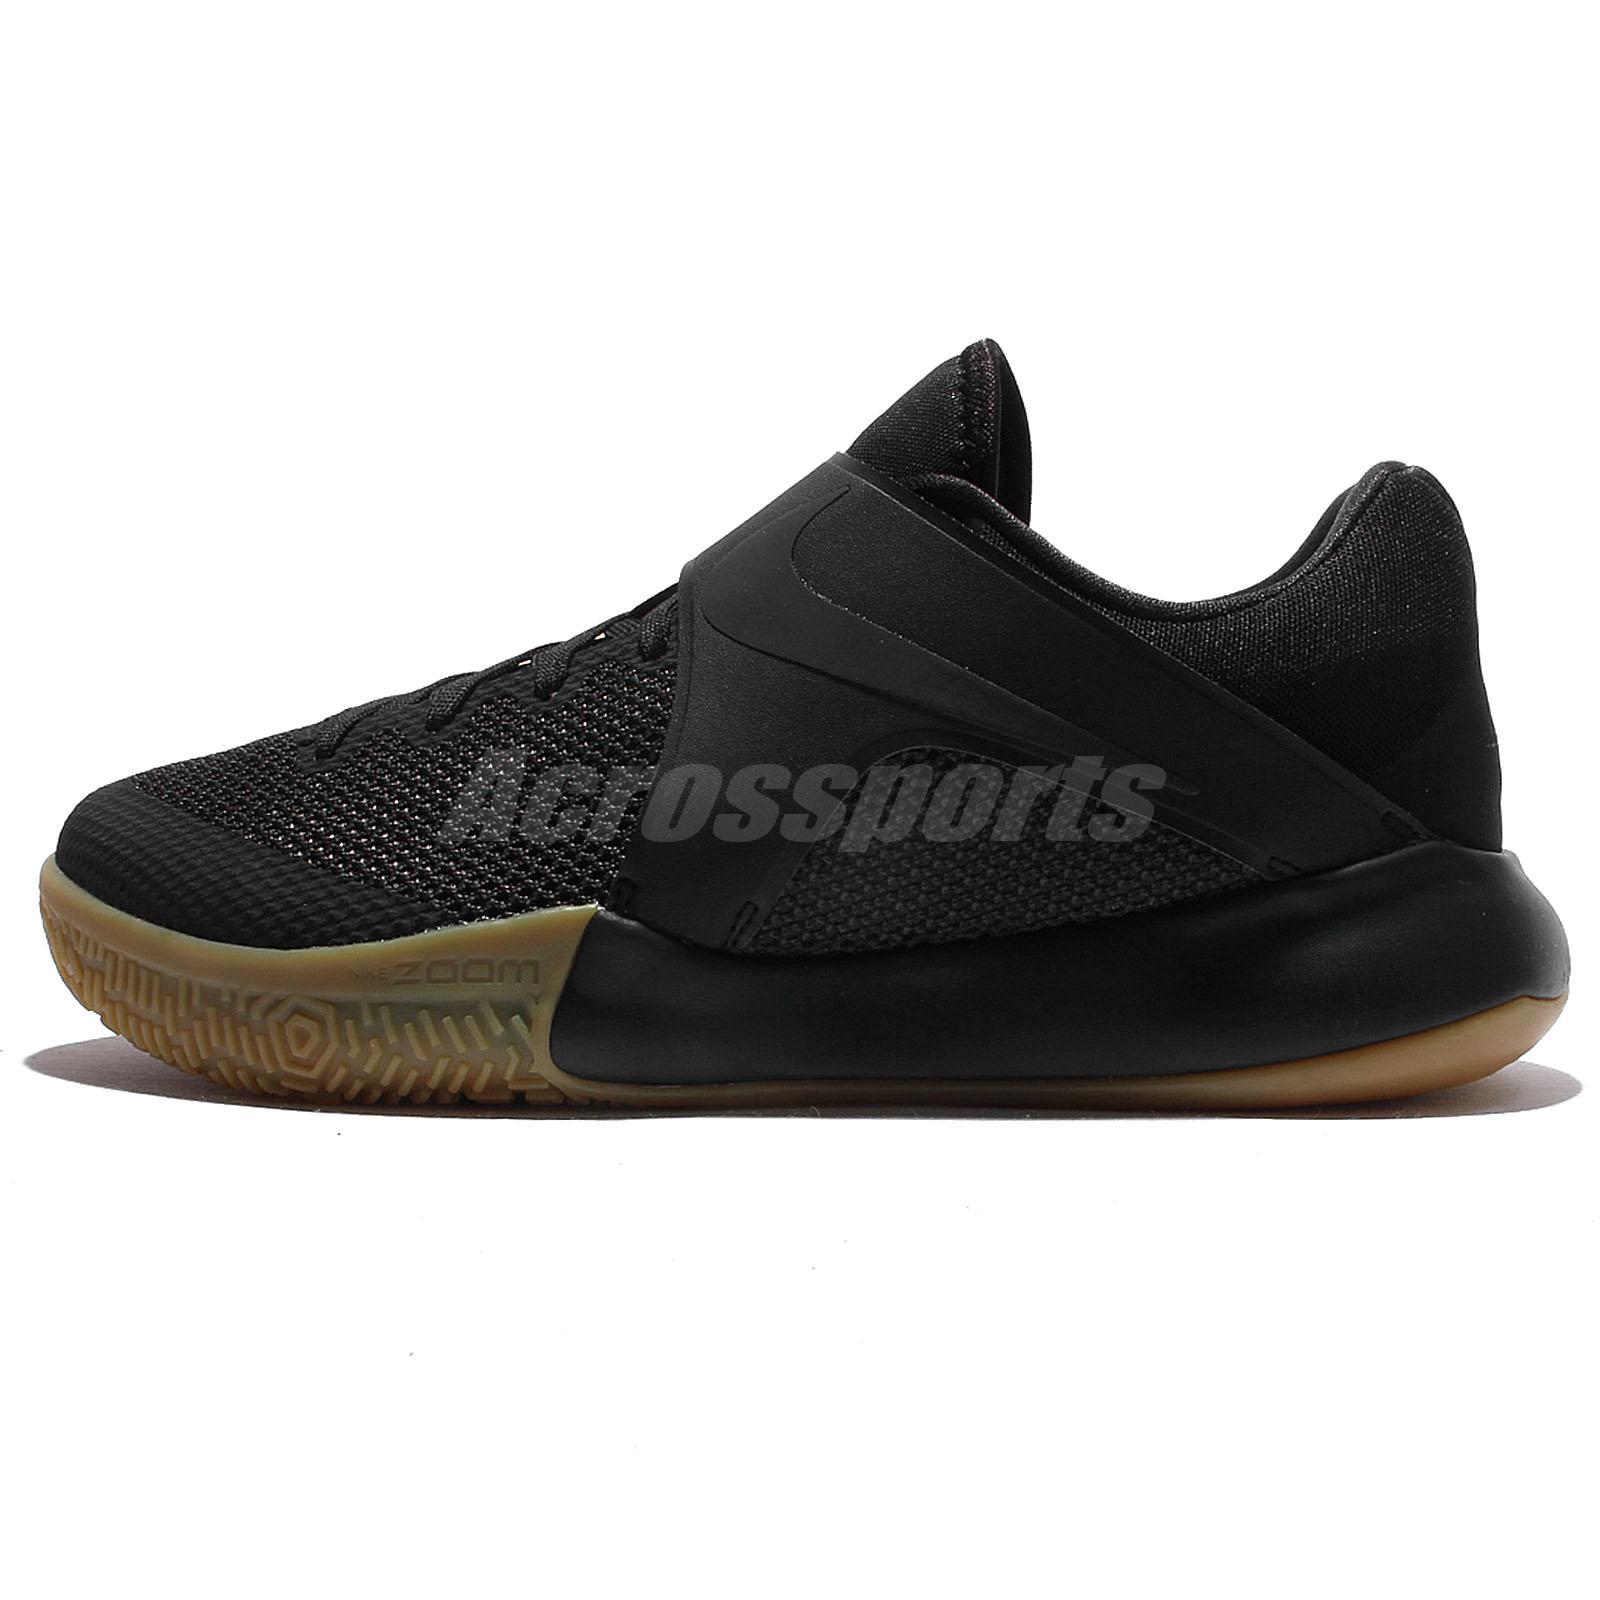 ded8c7e87c5c ... sneaker Nike Zoom Live EP 2017 HyperLive Black Gum Men Basketball Shoes  852420-011 ...